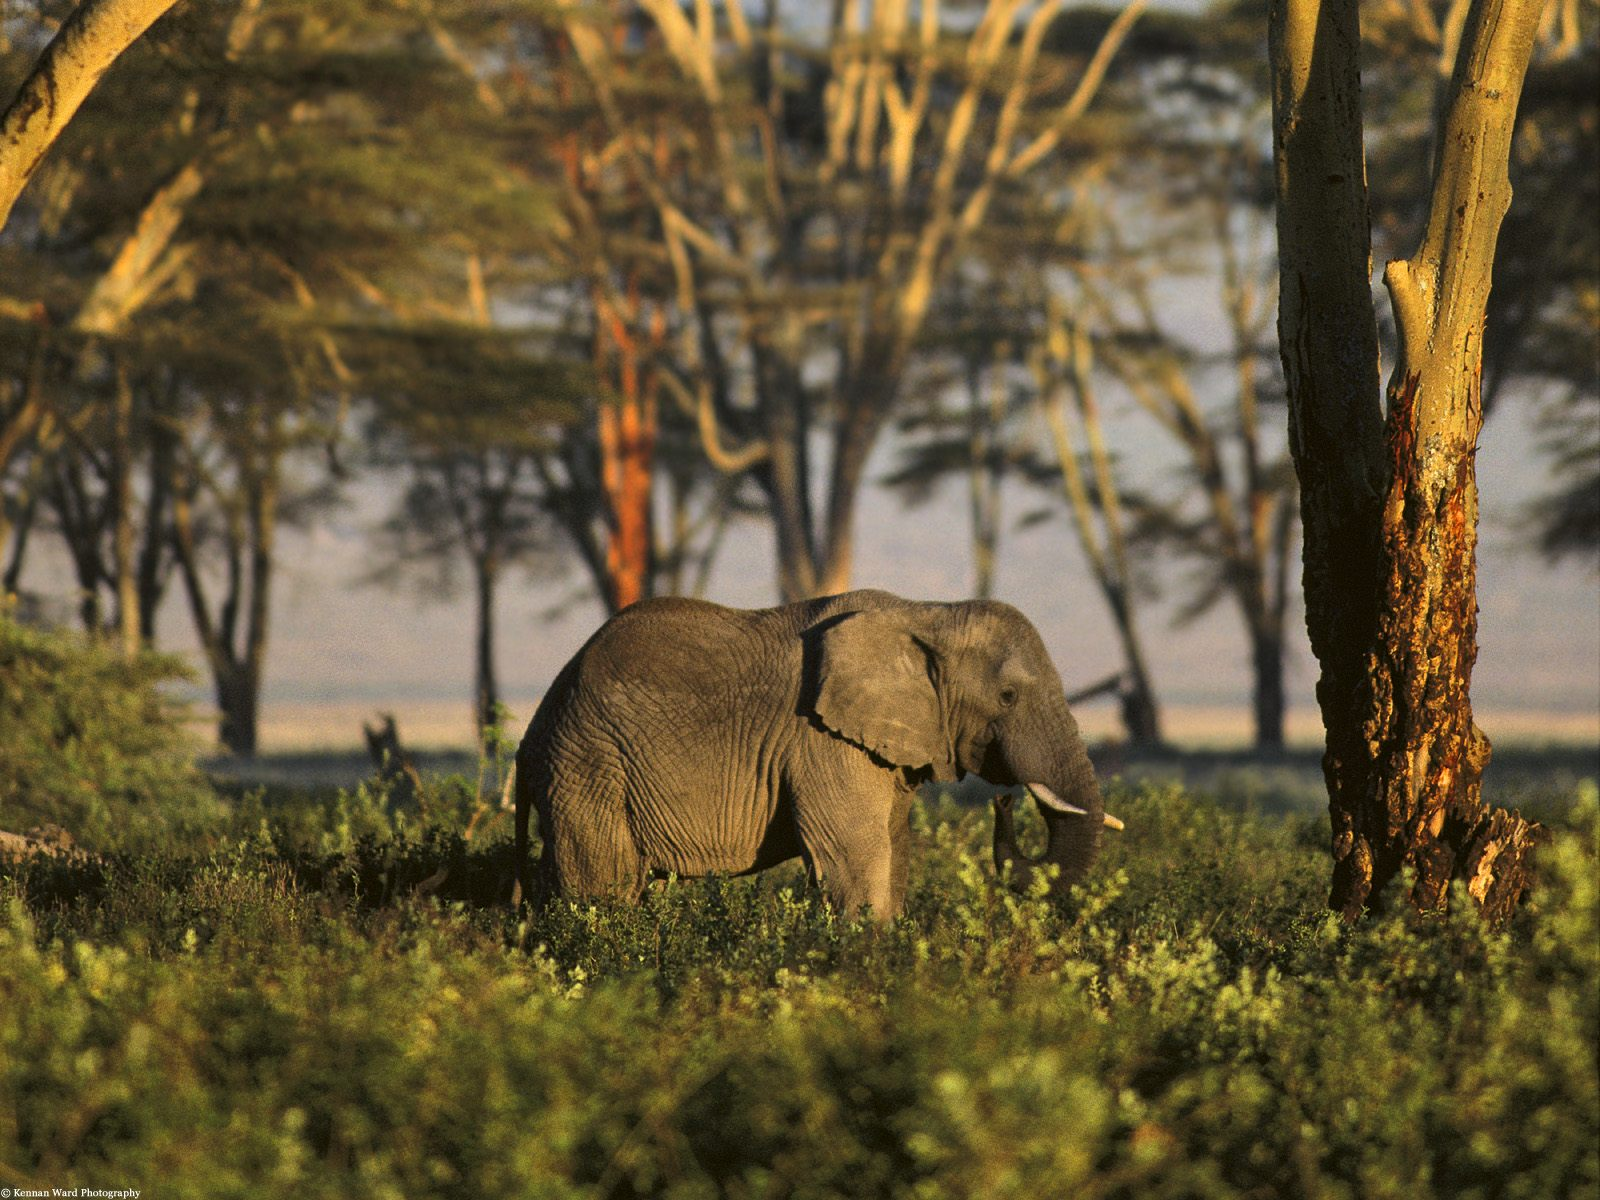 African Elephant Tanzania Africa